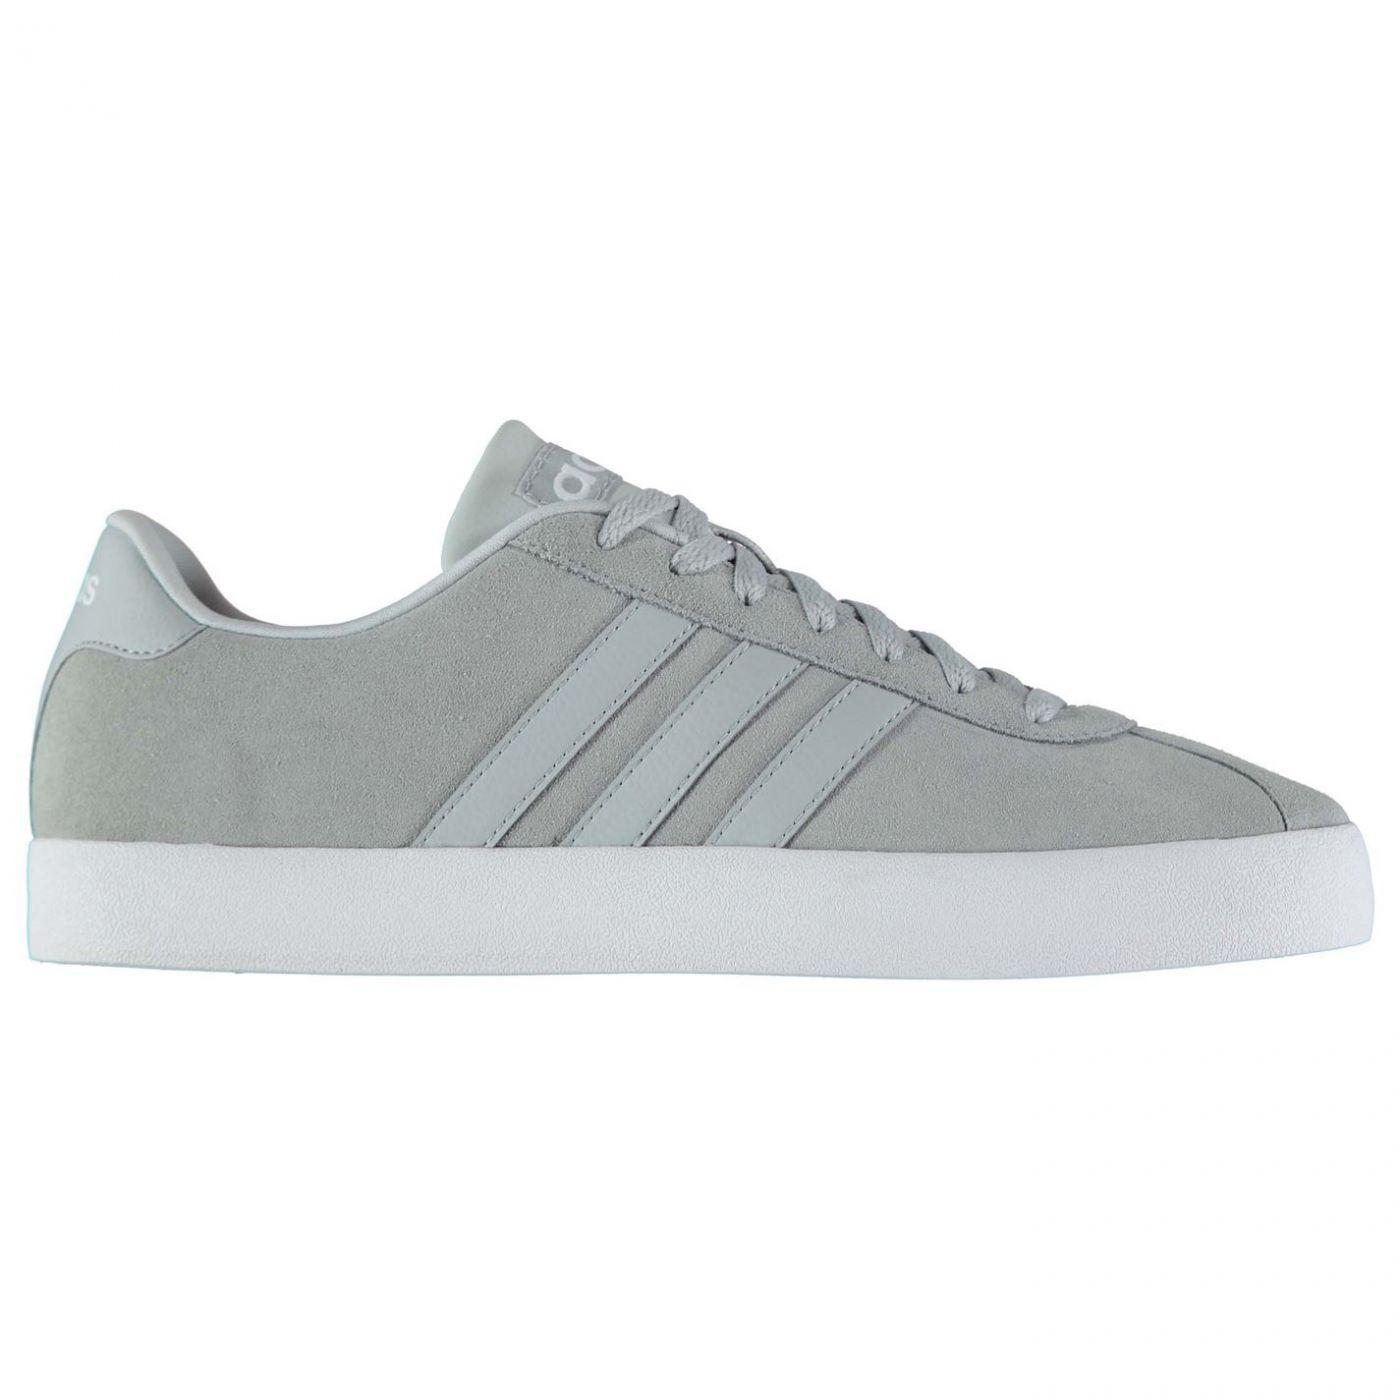 dec170afbae4 boty adidas Court Vulc Suede pánské - ALIATIC